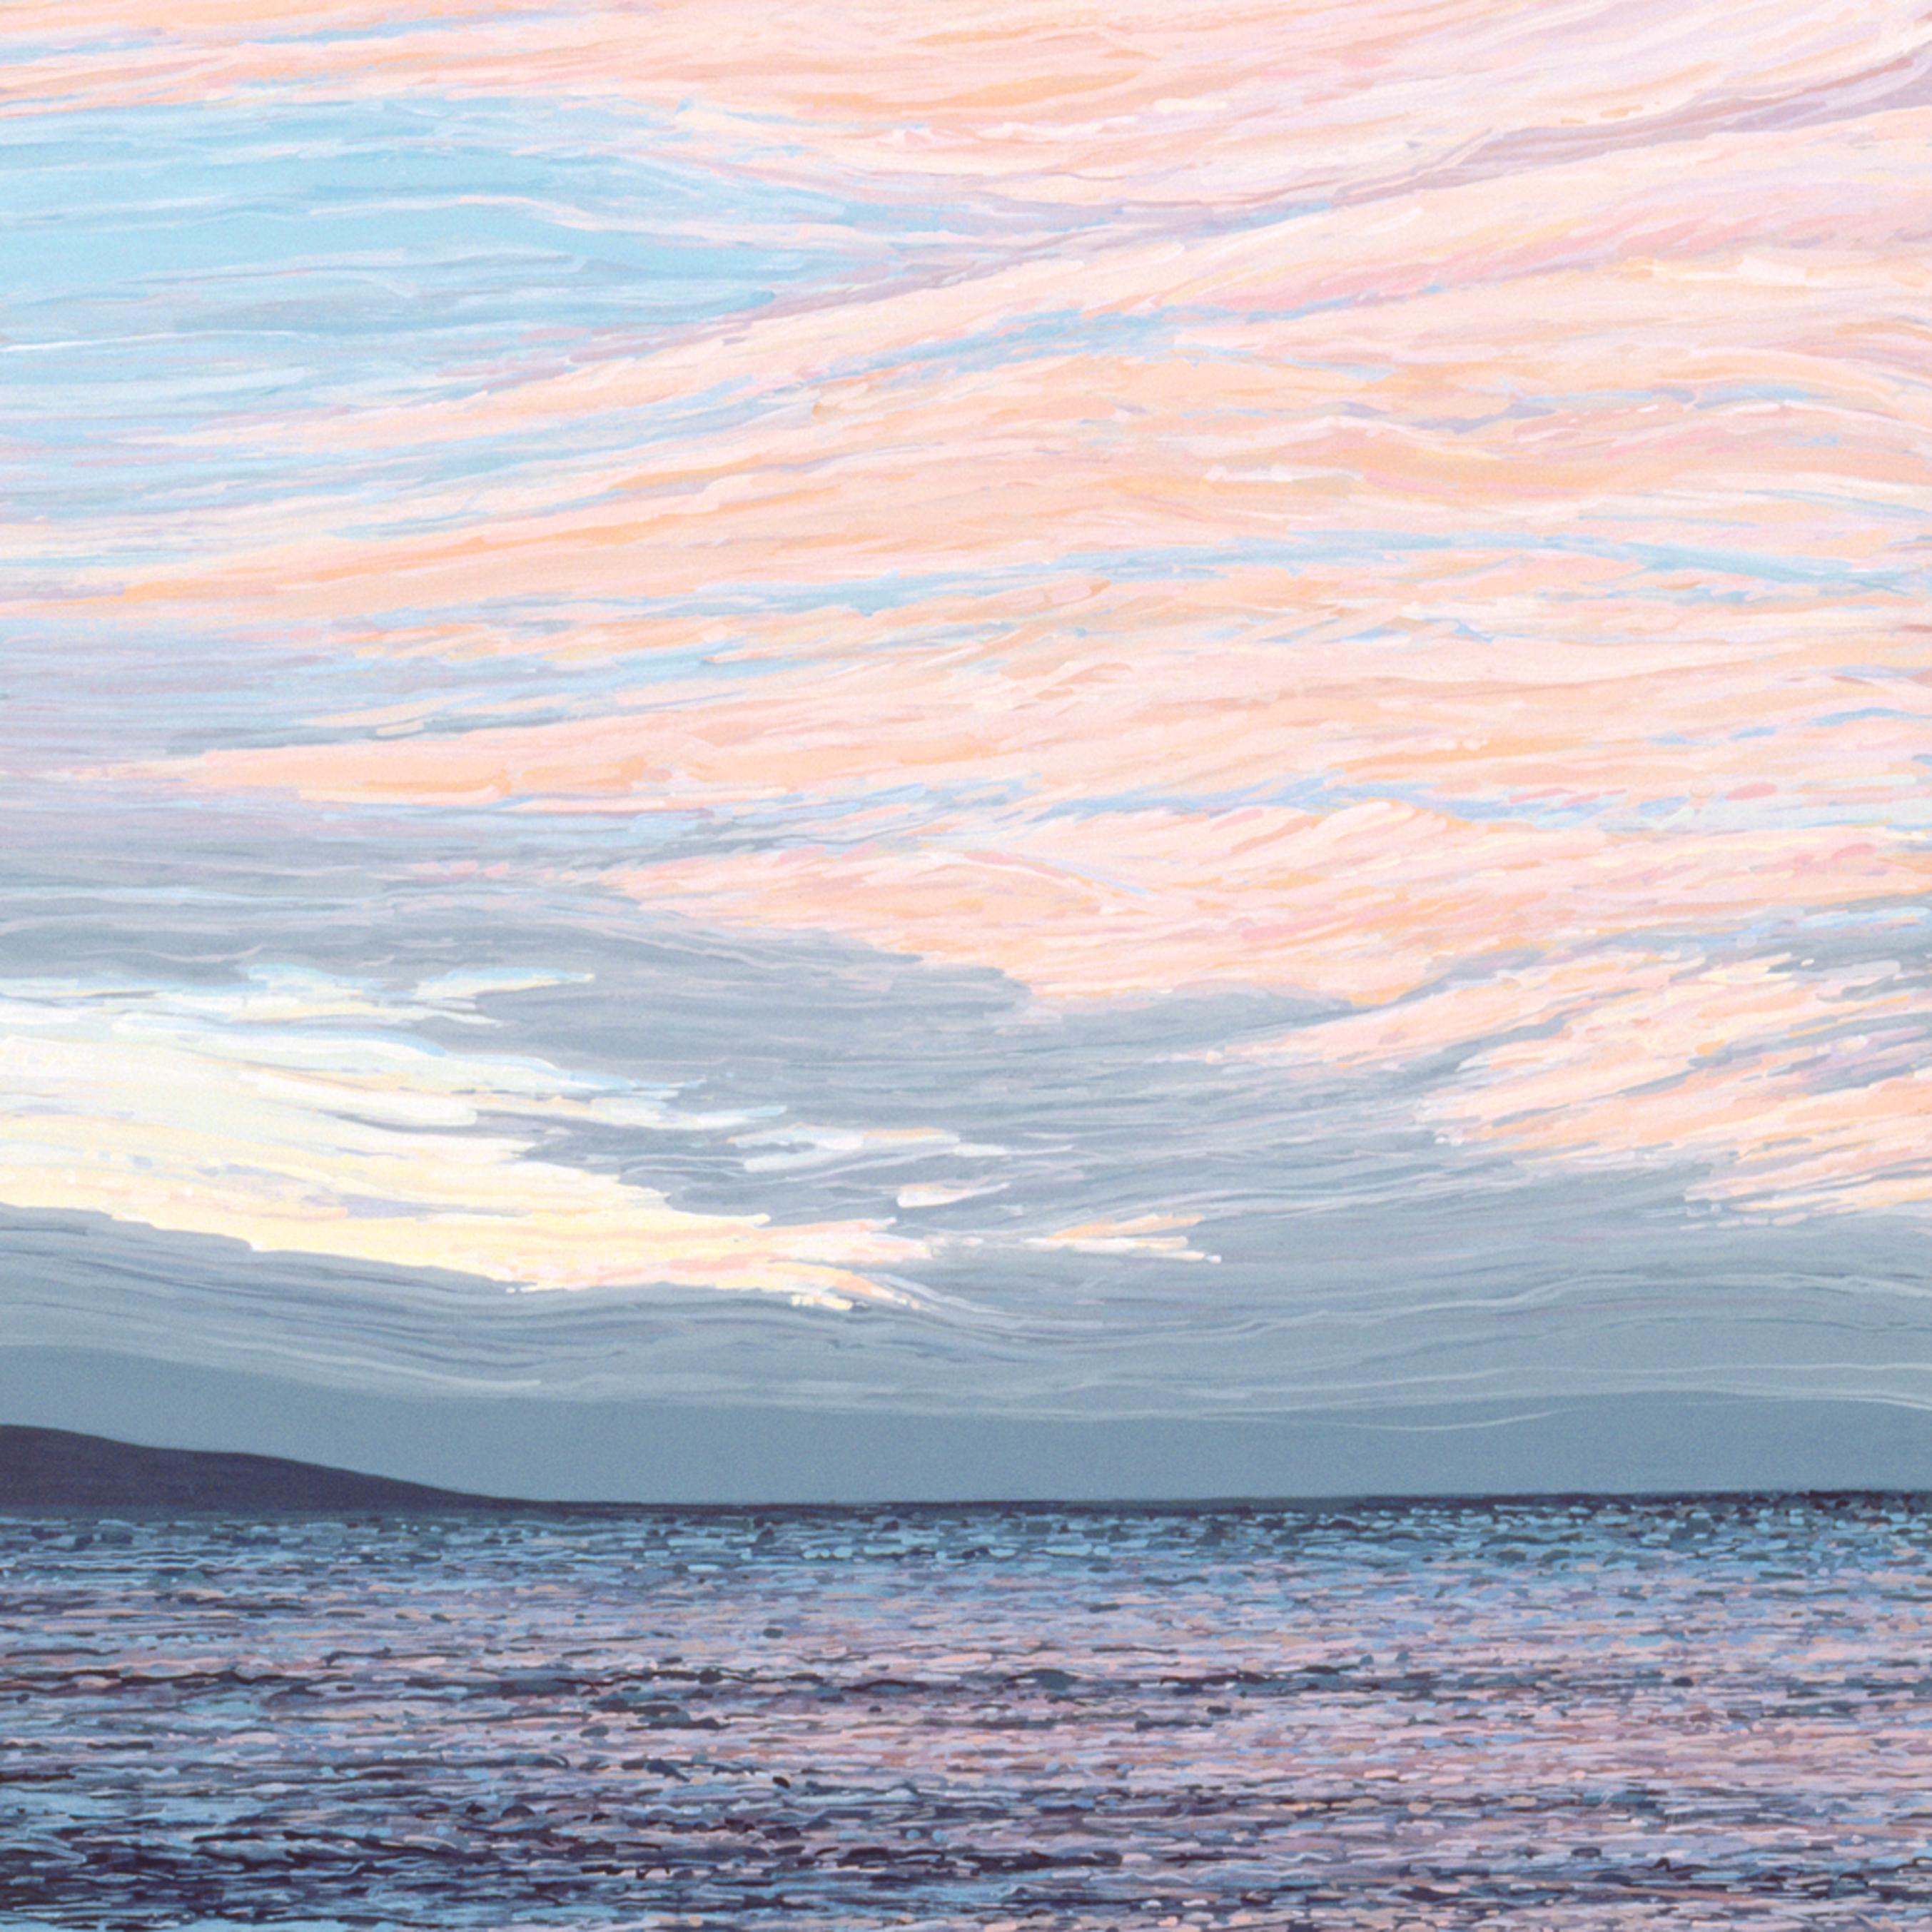 Sunset 7x23 fhdidg